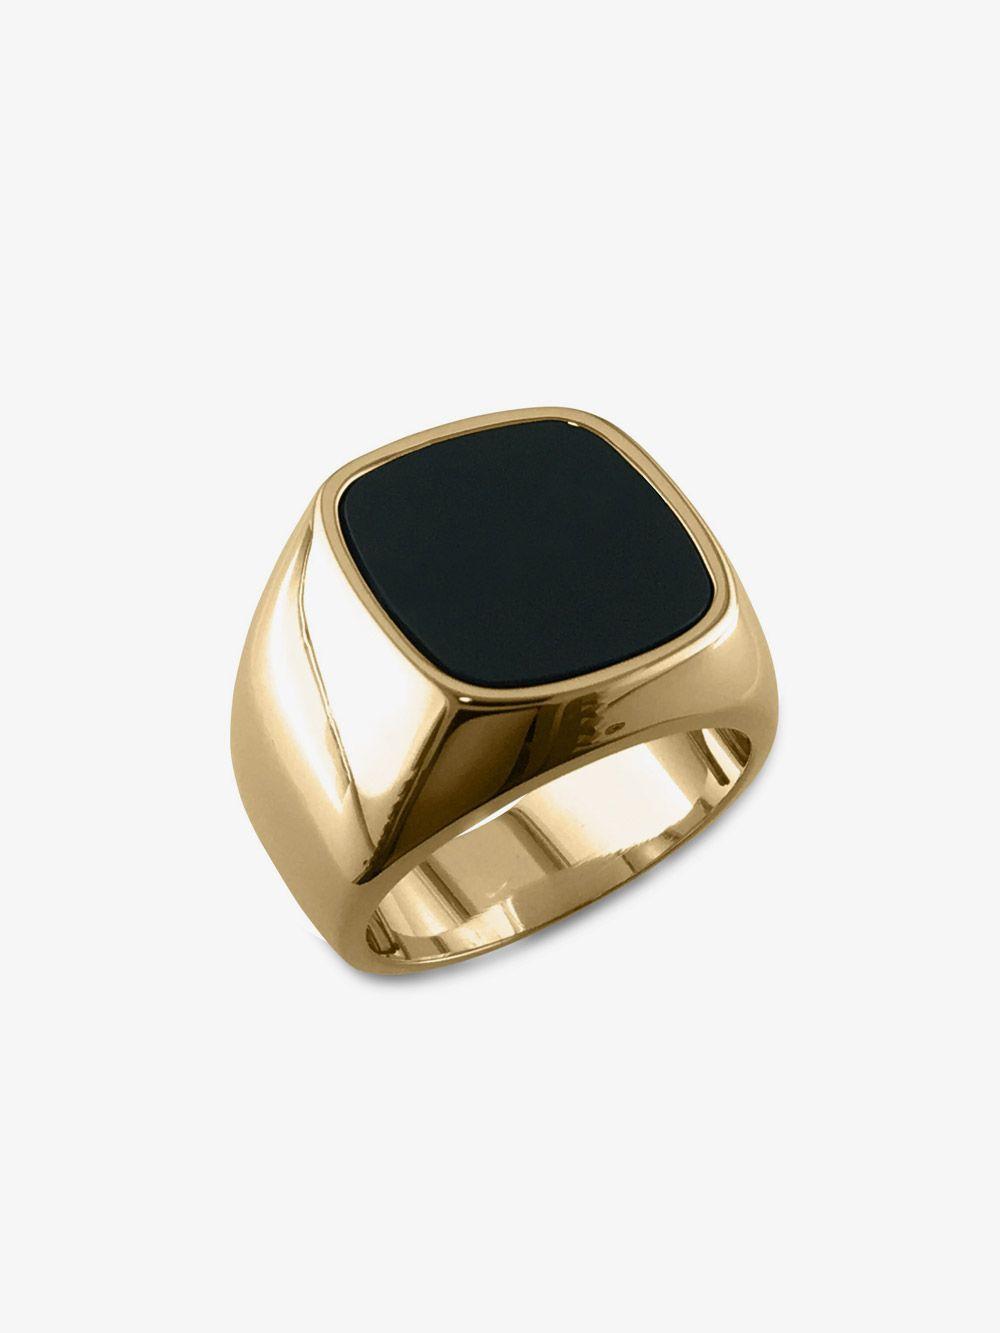 Mens ring vintage Rings men onyx ring Silver black ring Mens black stone ring Black gemstone ring Black signet ring Black onyx jewelry